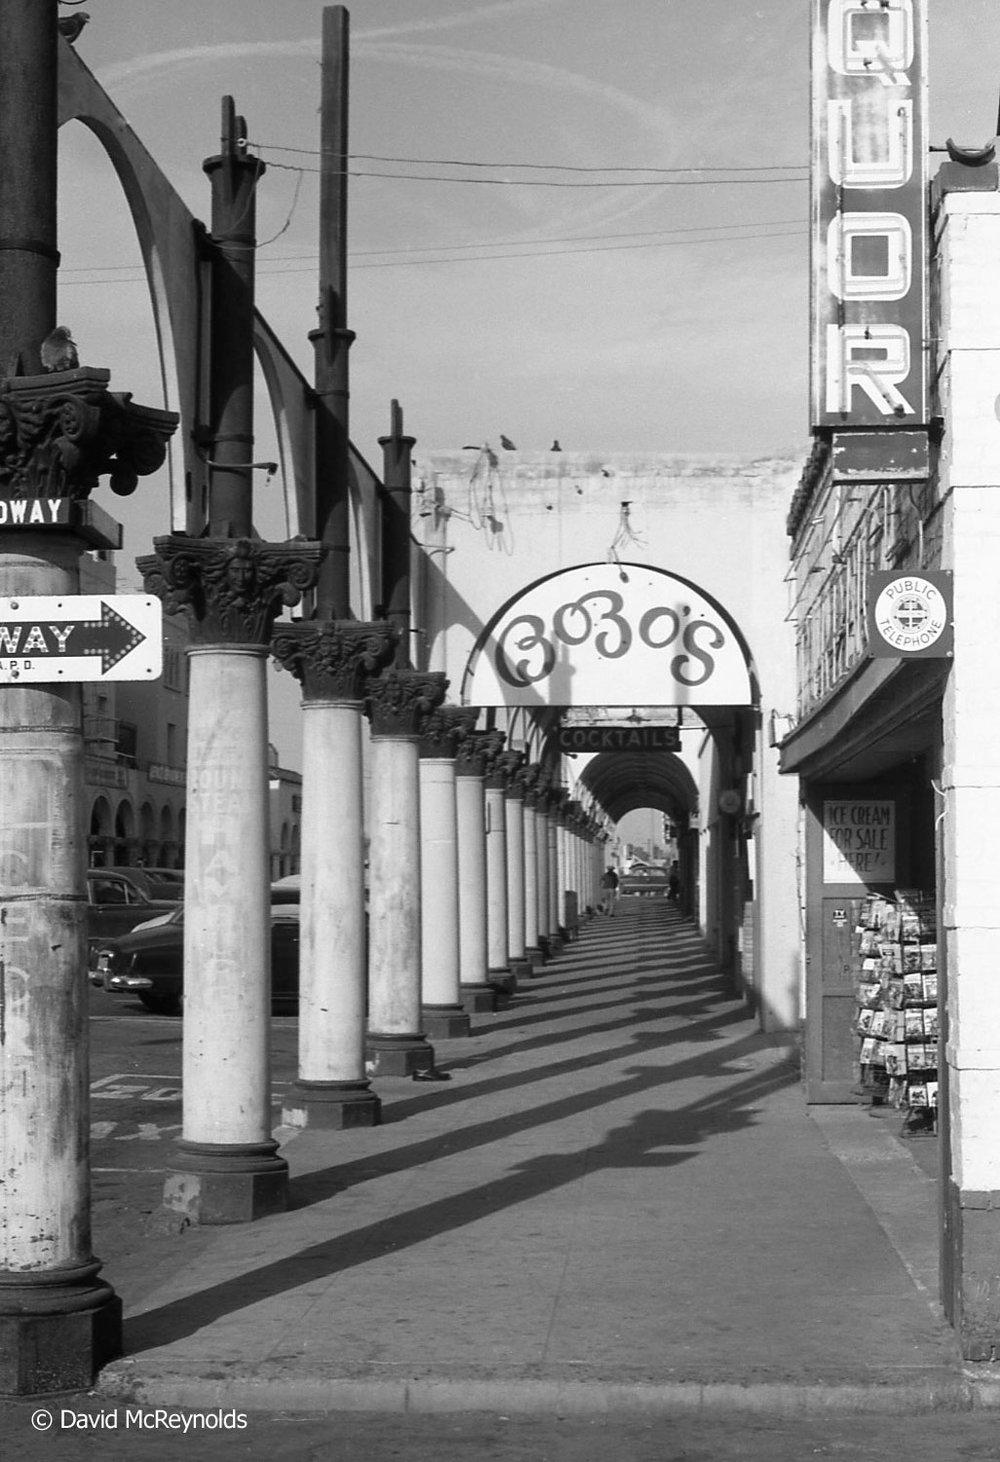 Bozos, Venice 1956.